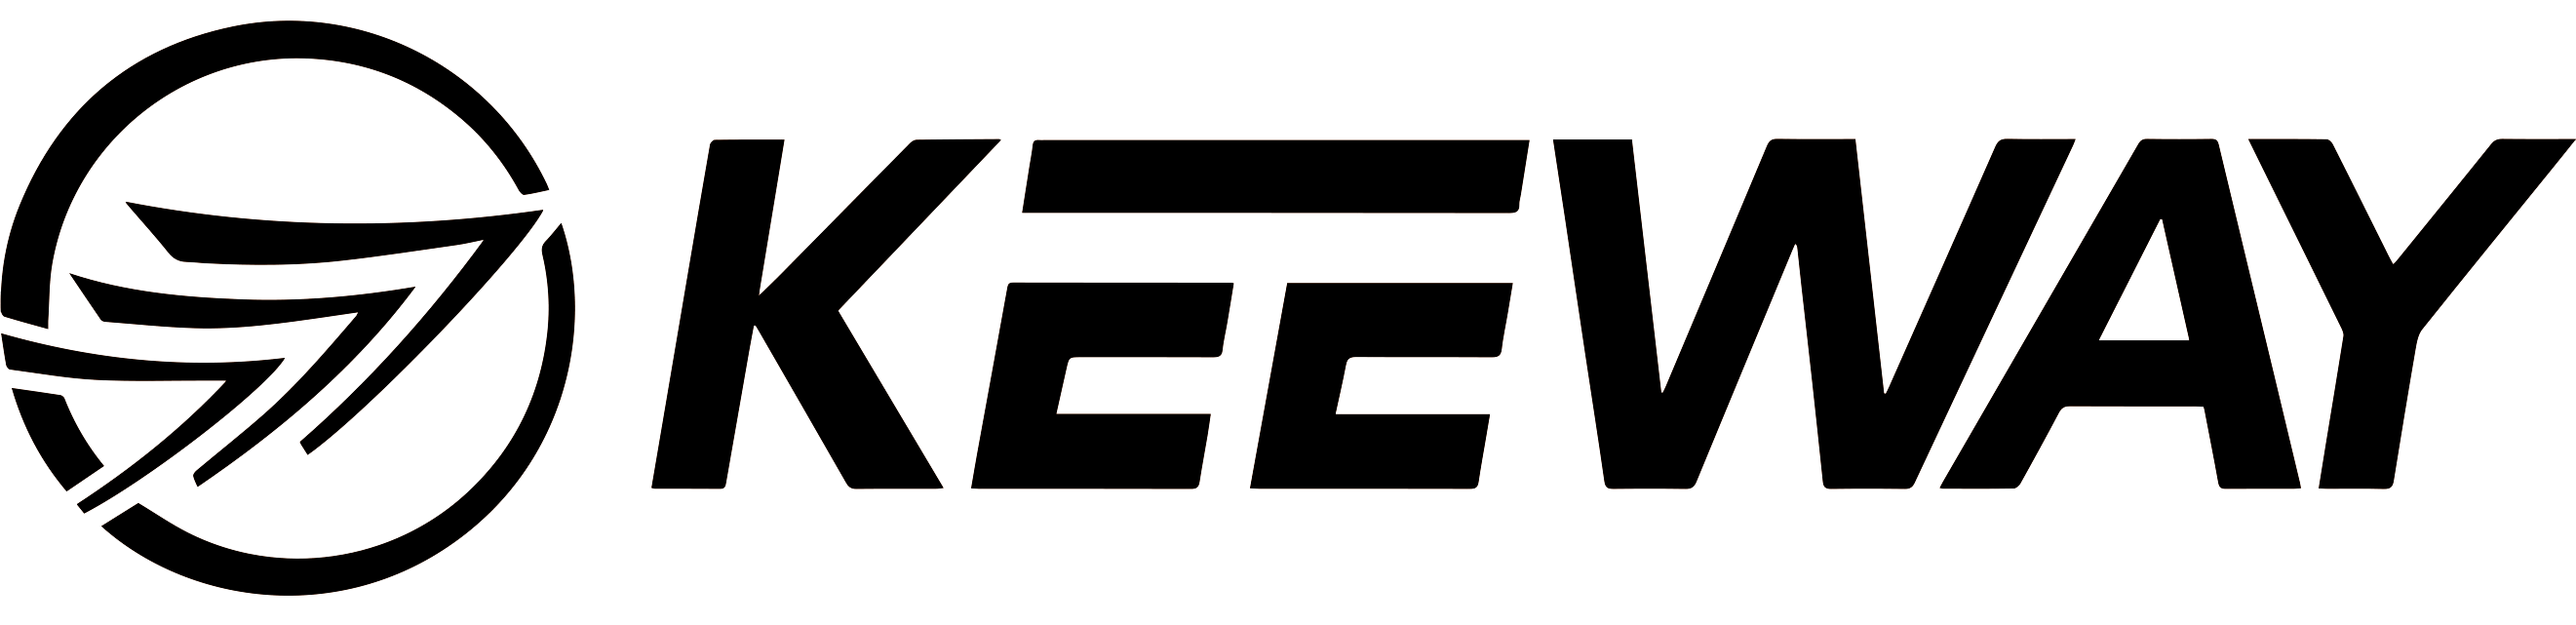 logo-keeway-concesionario-motissimo-barcelona